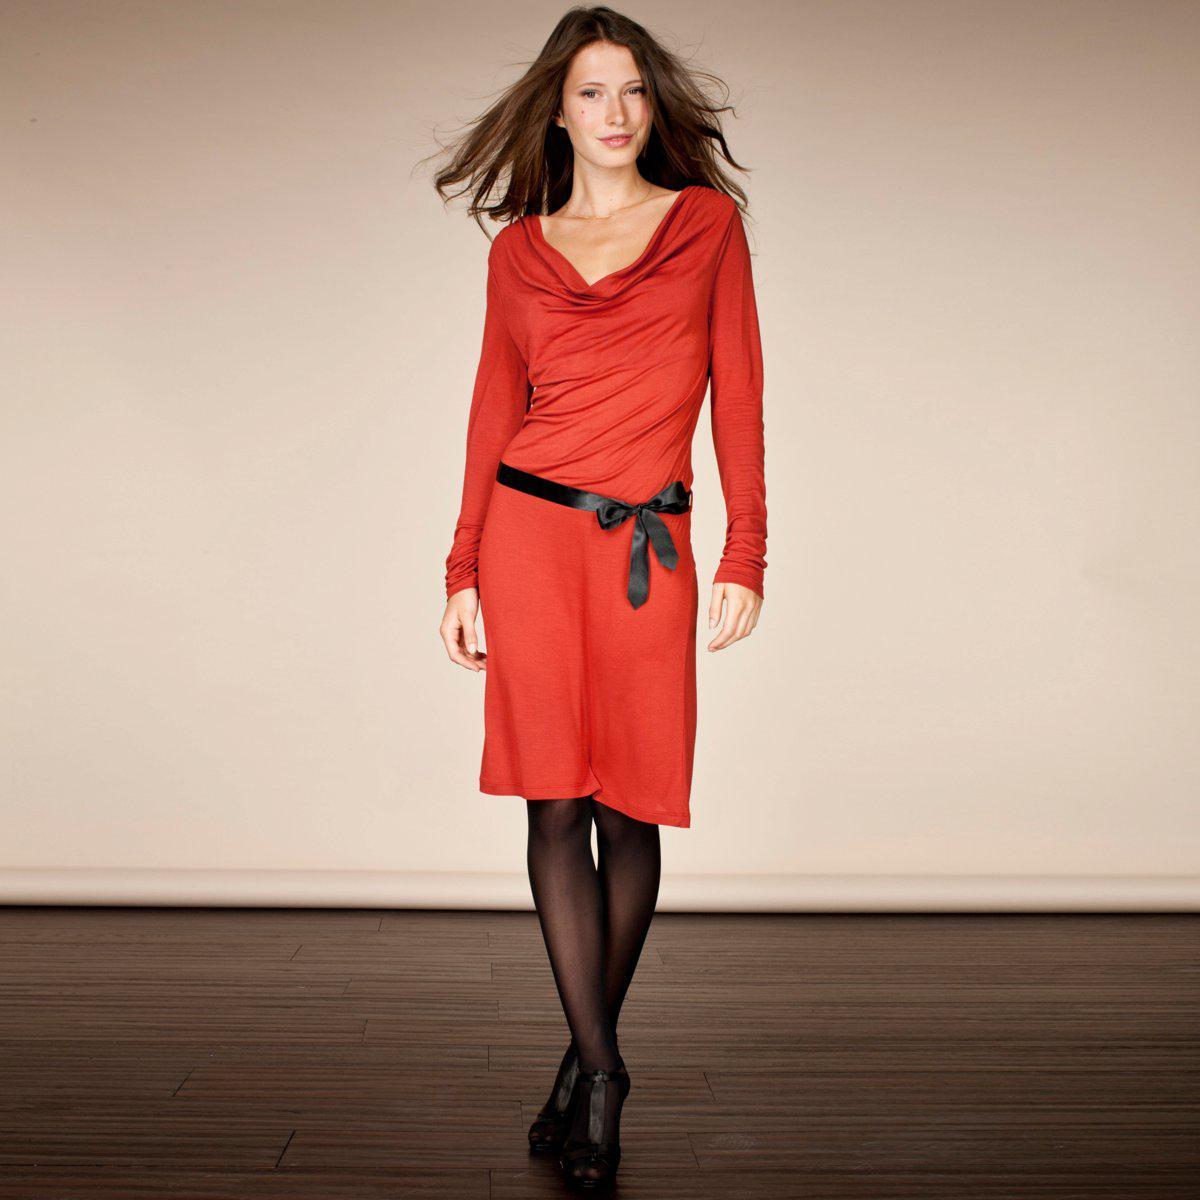 bradyna foremata 230 - Βραδυνα Φορεματα LaRedoute Φθινόπωρο 2011 Κωδ. 324259876